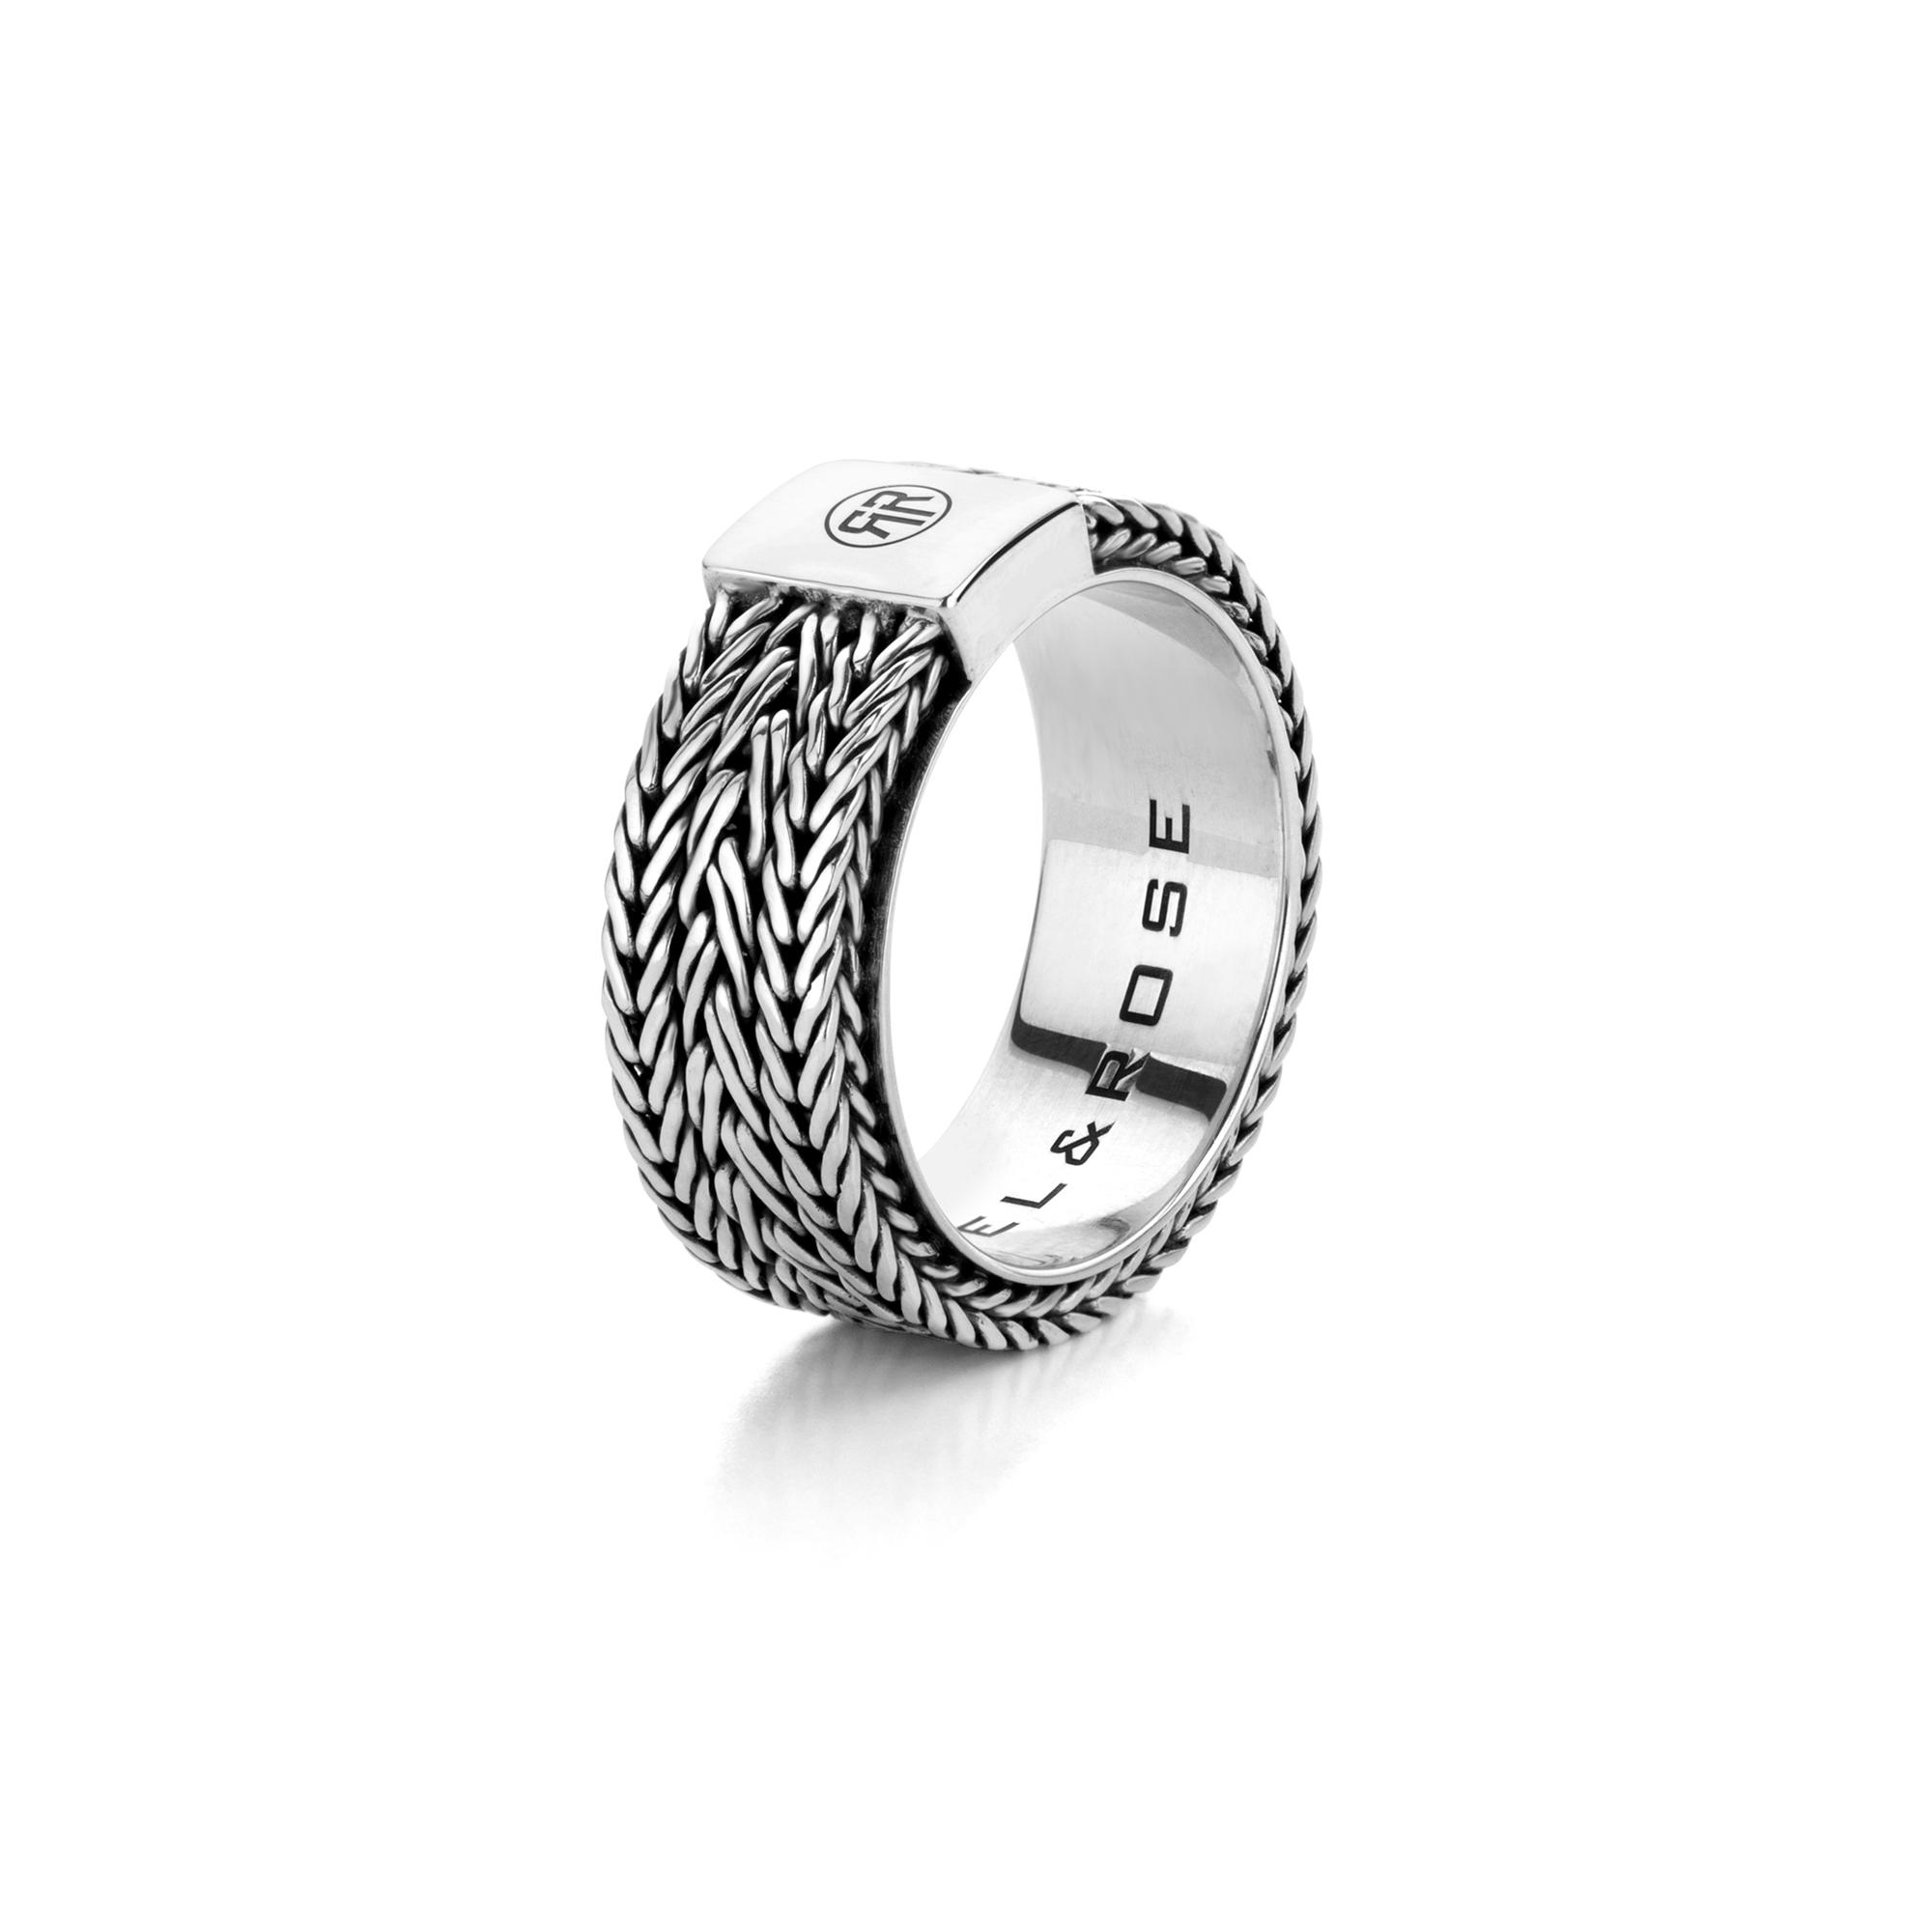 Rebel and Rose RR RG020 S Ring Triton zilver Maat 57